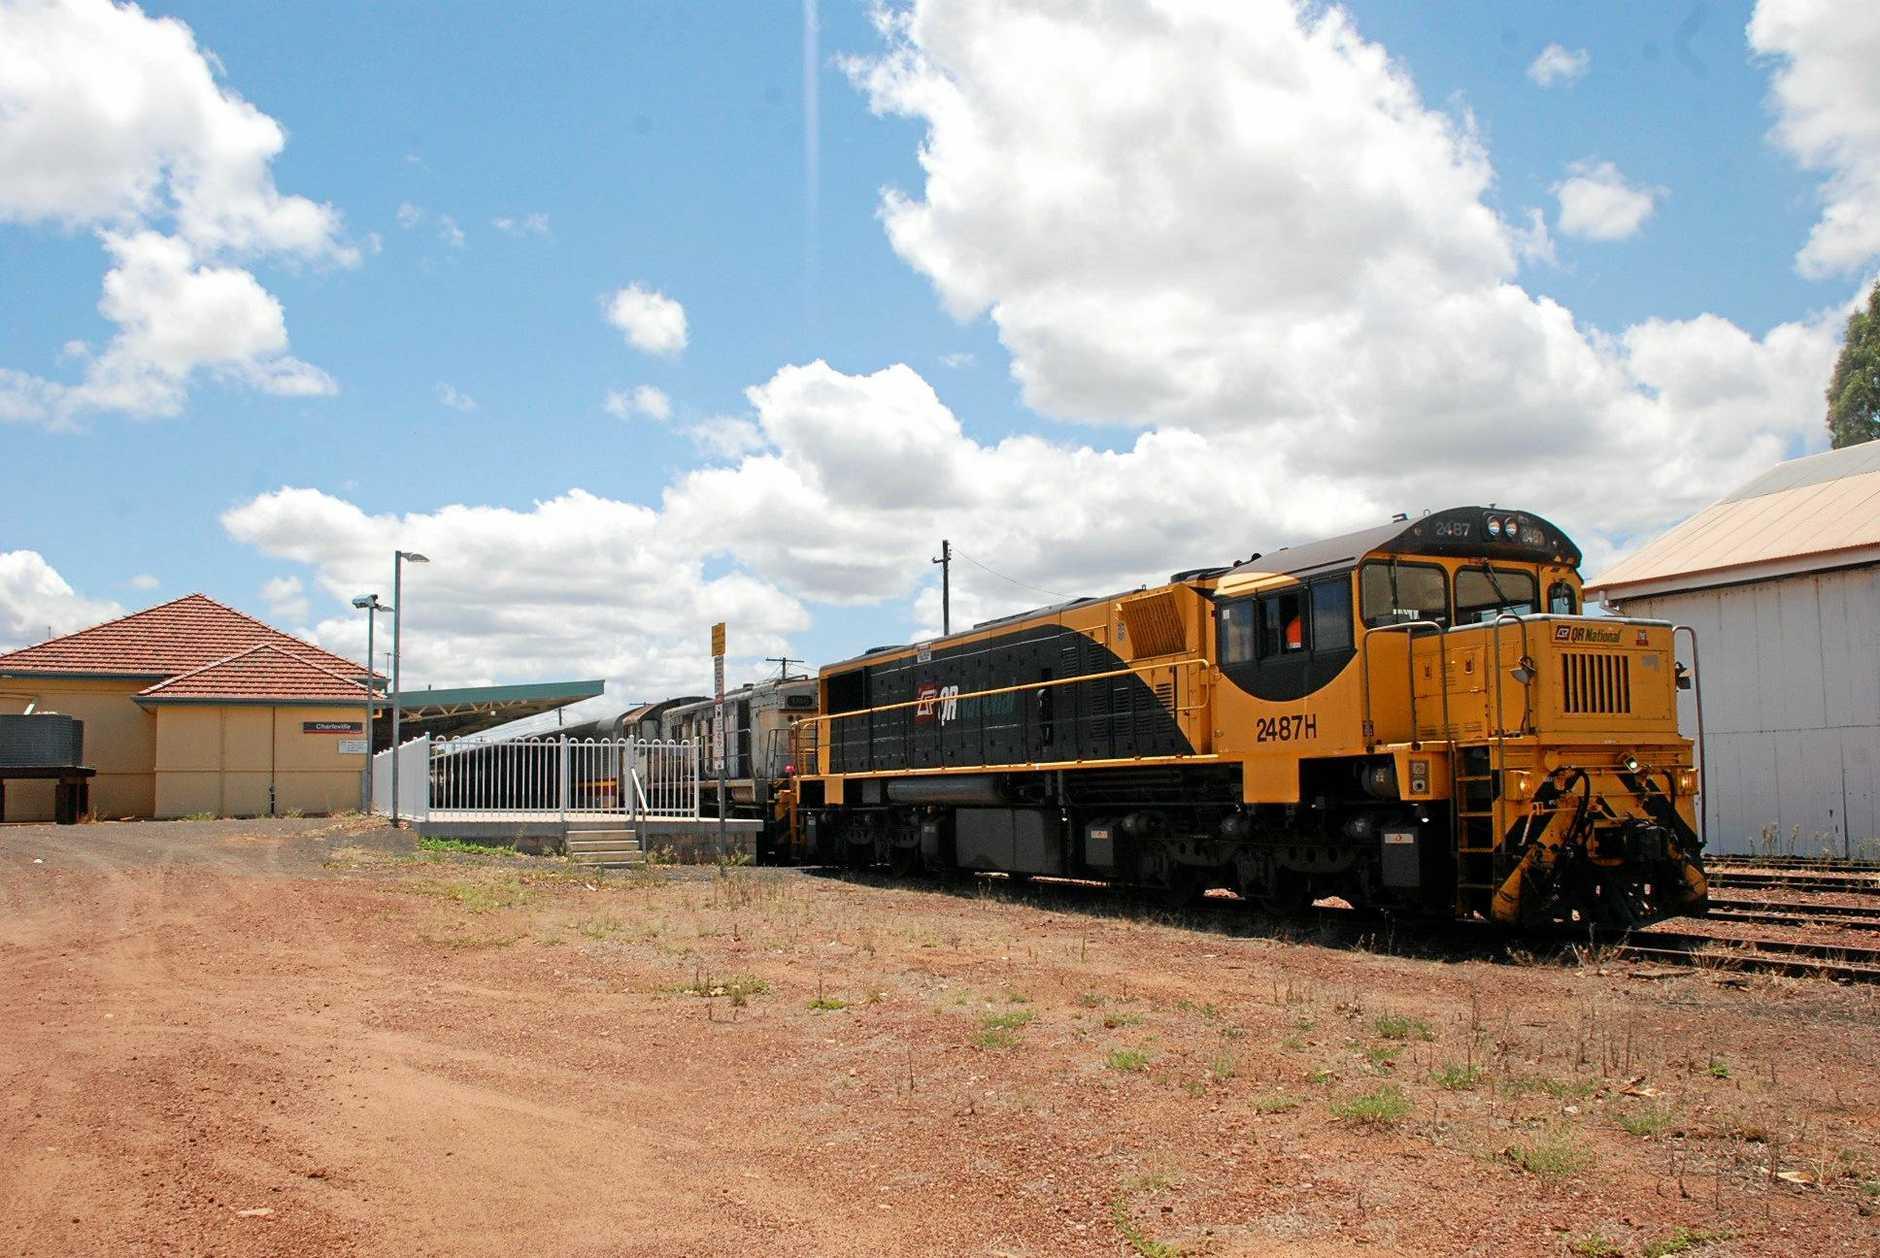 The Westlander train.